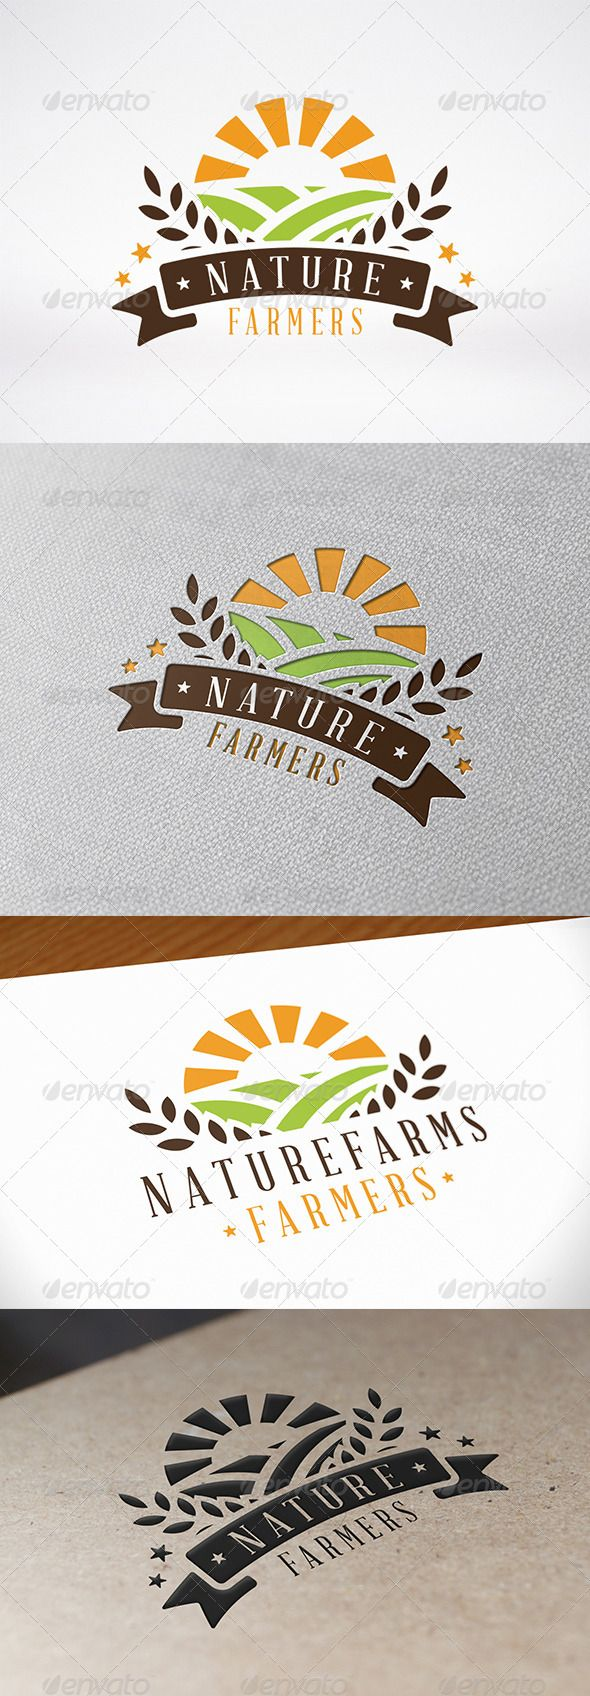 Agri cultures project logo duckdog design - Green Farm Logo Template